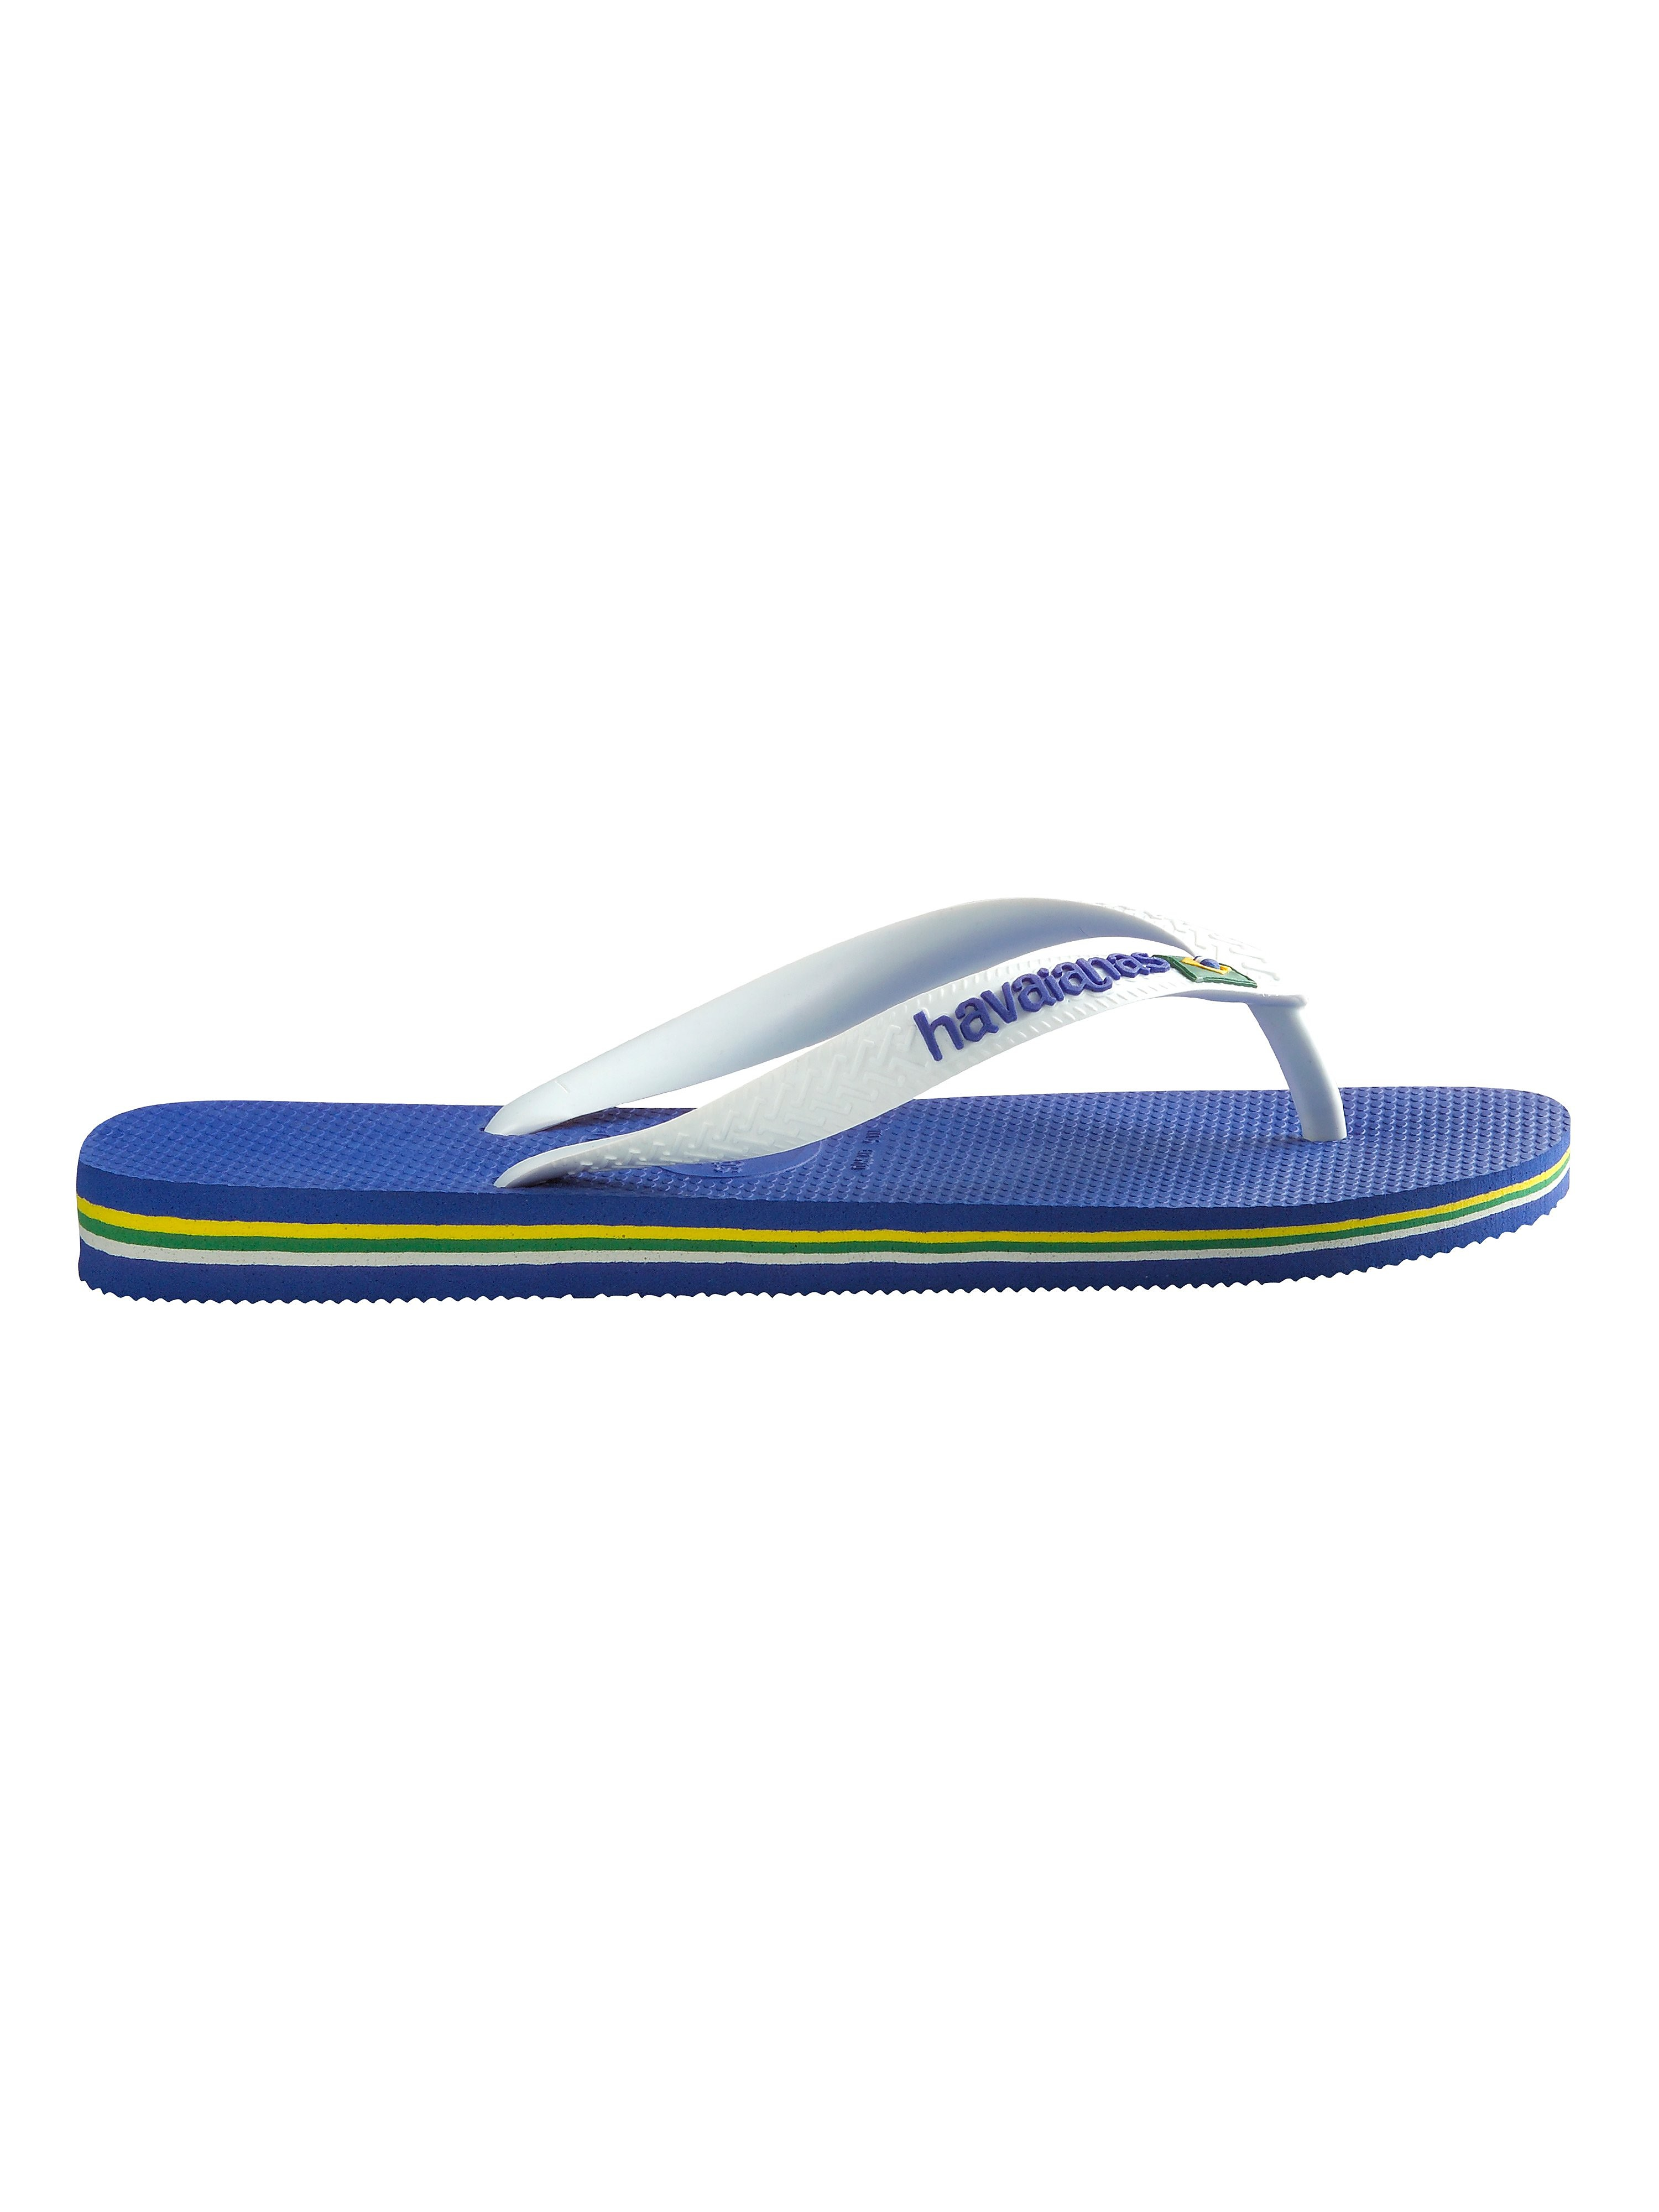 Havaianas Brazil Logo Flip Flops - Marine Blue